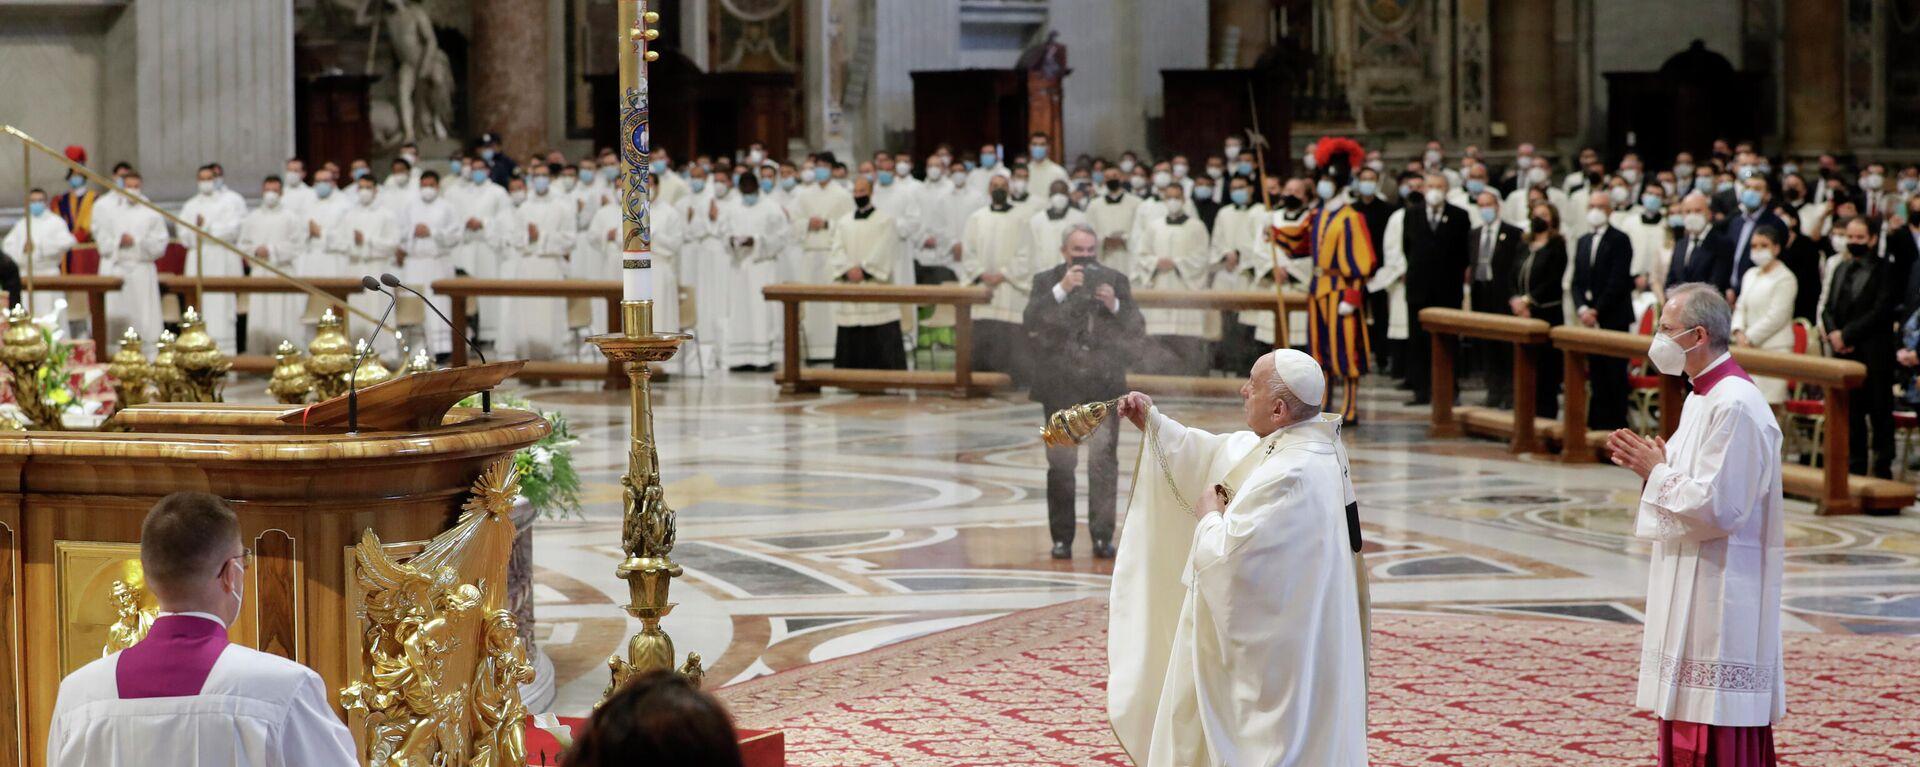 Papa Francisco en la misa en la Catedrál de San Pedro en el Vaticano - Sputnik Mundo, 1920, 22.07.2021